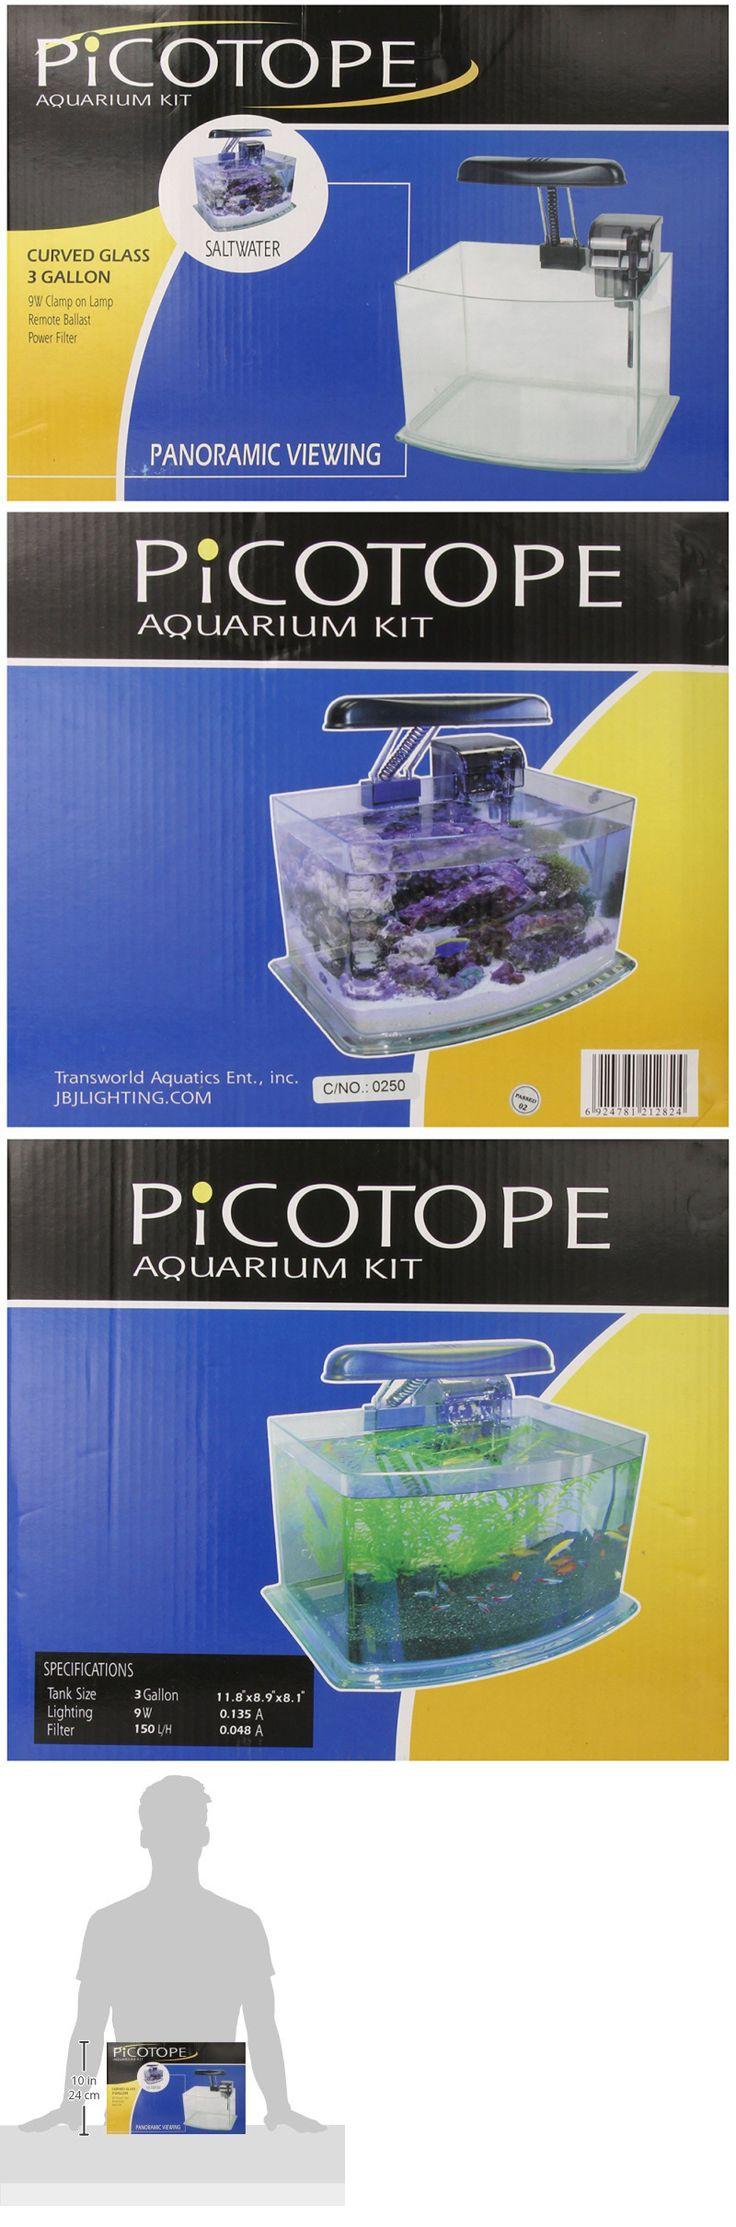 Jbj aquarium fish tank siphon gravel vacuum cleaner - Aquariums And Tanks 20755 Jbj Picotope Curved Glass Nano Aquarium Kit 3 Gallon Buy It